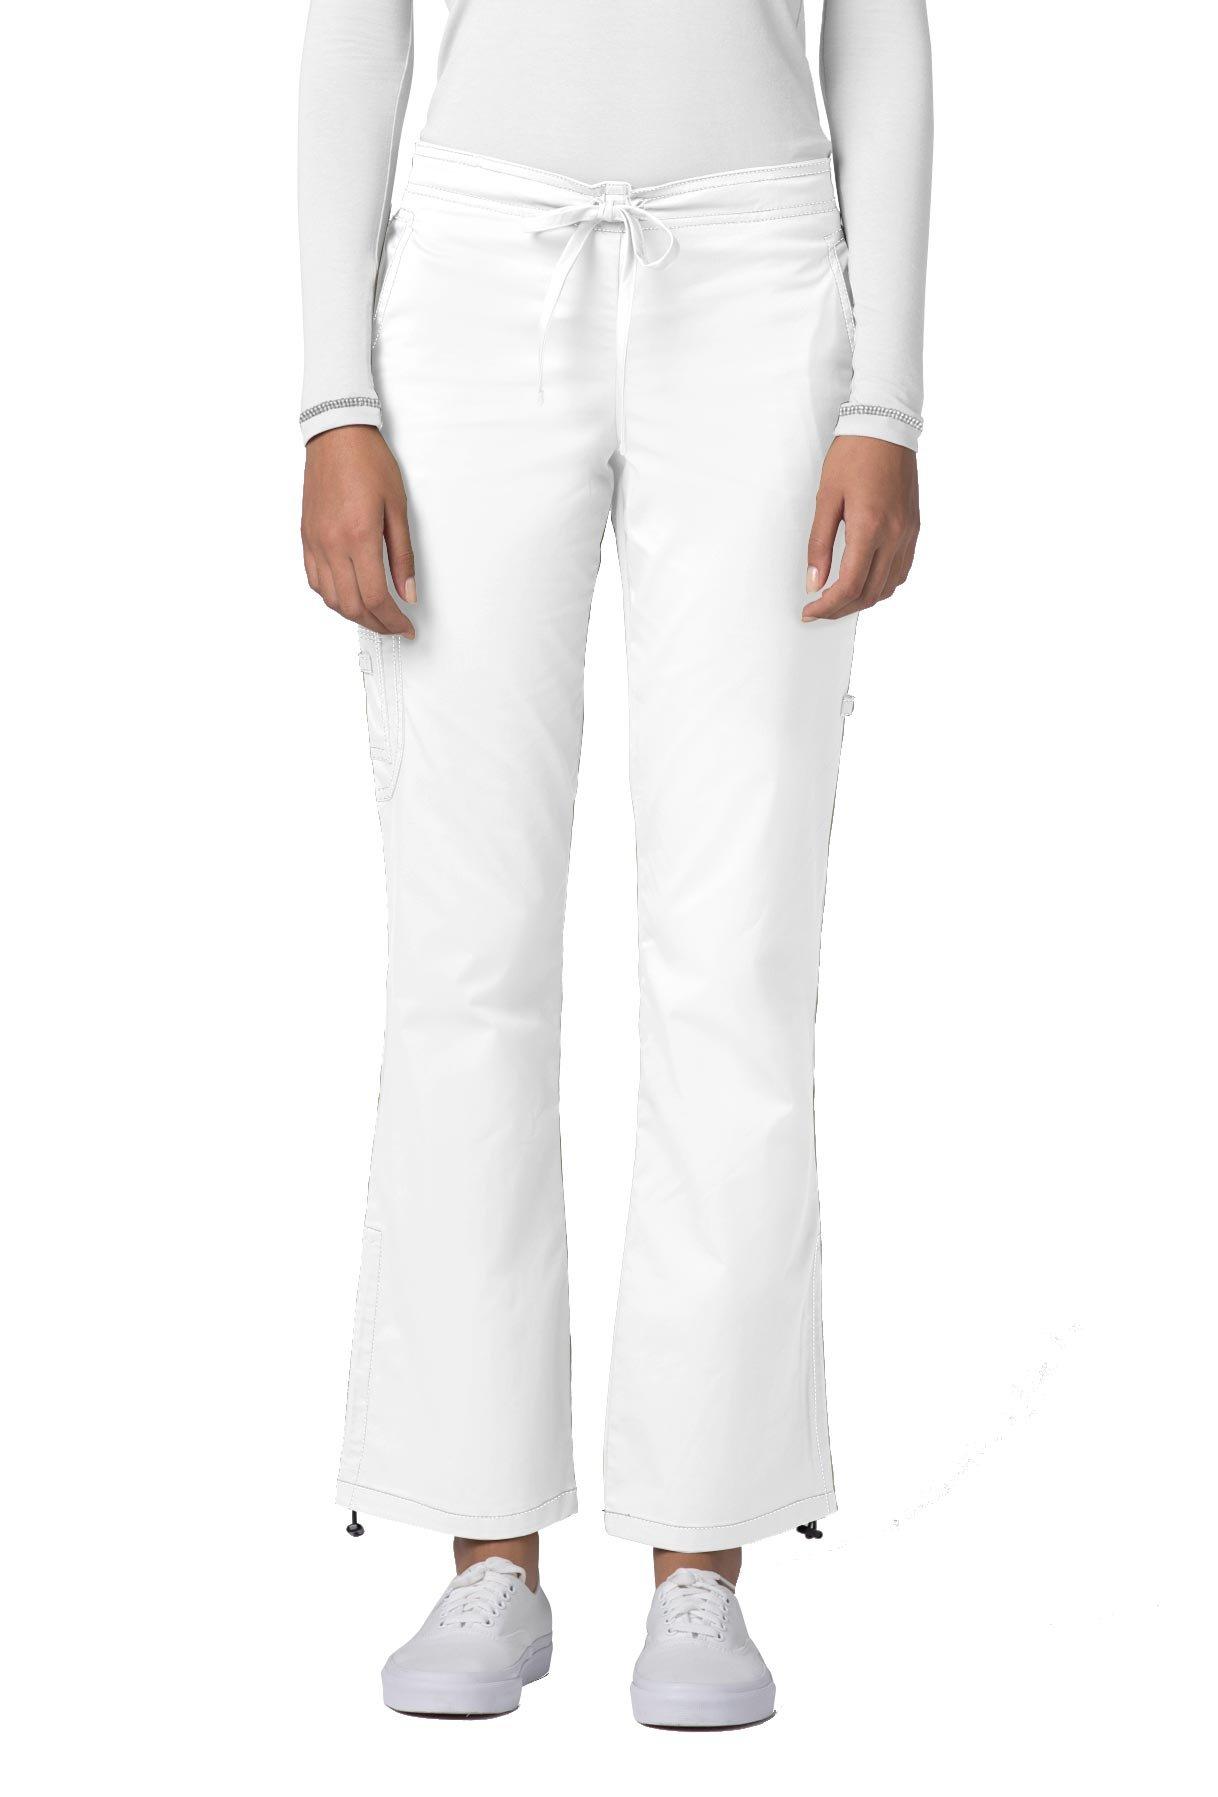 Adar Pop-Stretch Junior Fit Low Rise Boot Cut Bungee Leg Pants - 3102 - White - XL